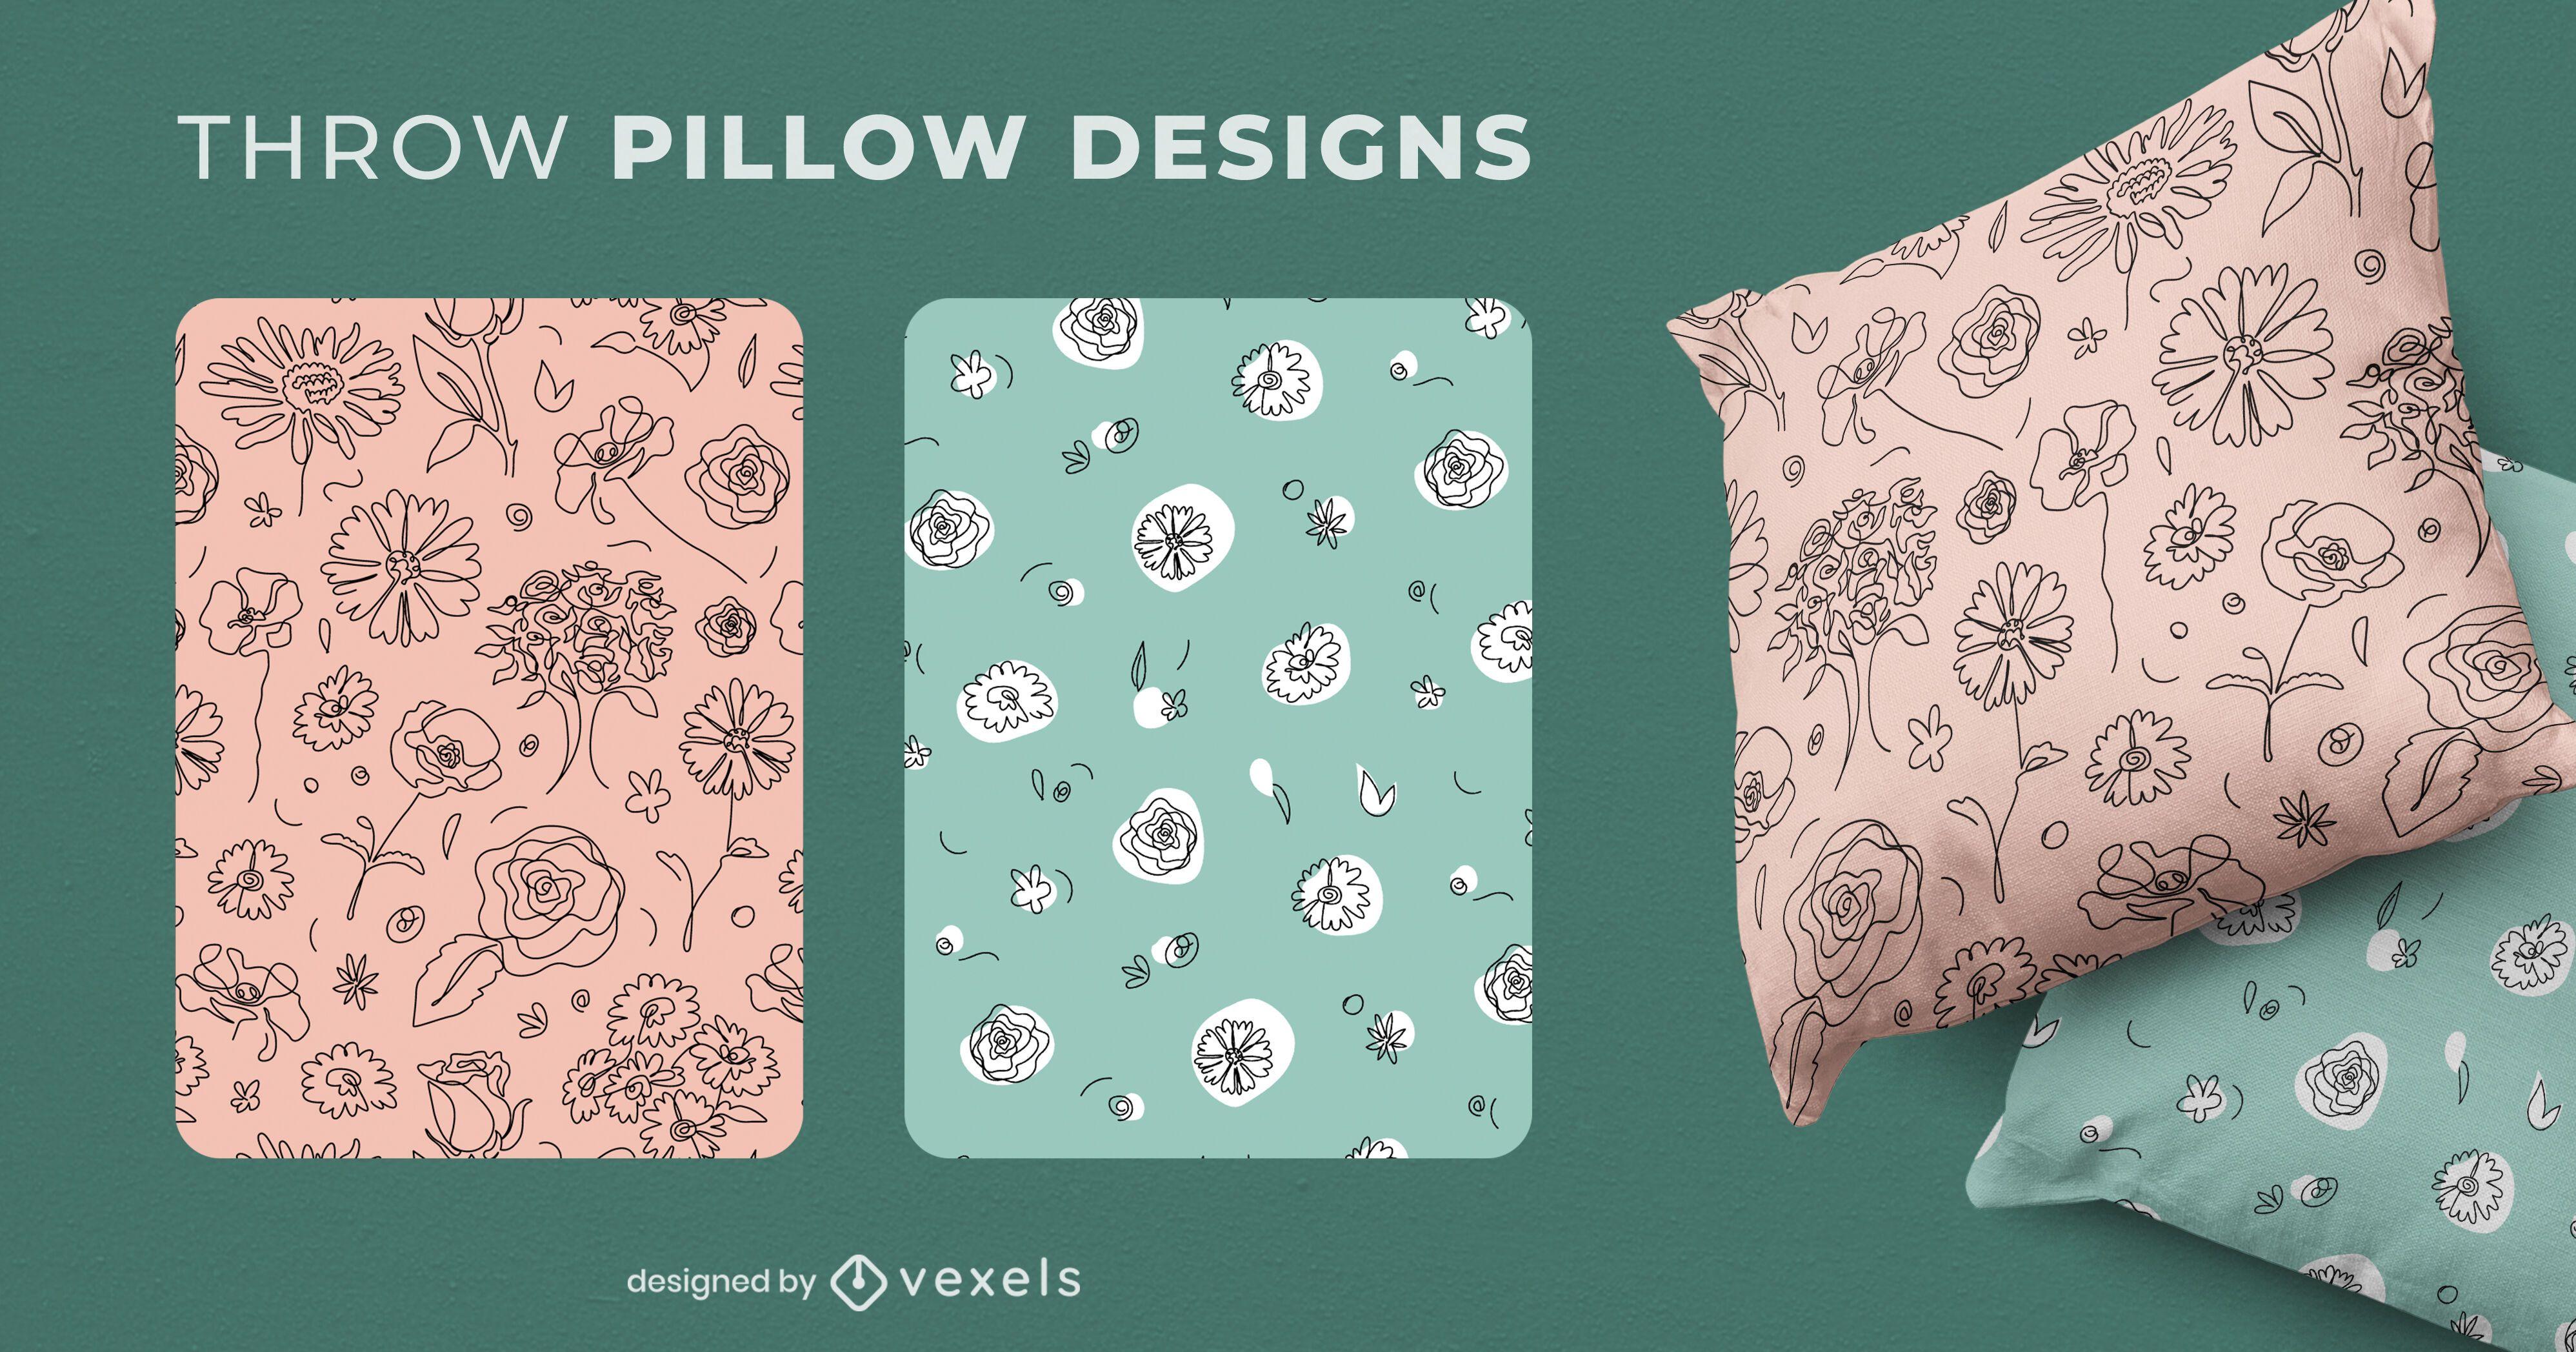 Flowers throw pillow designs